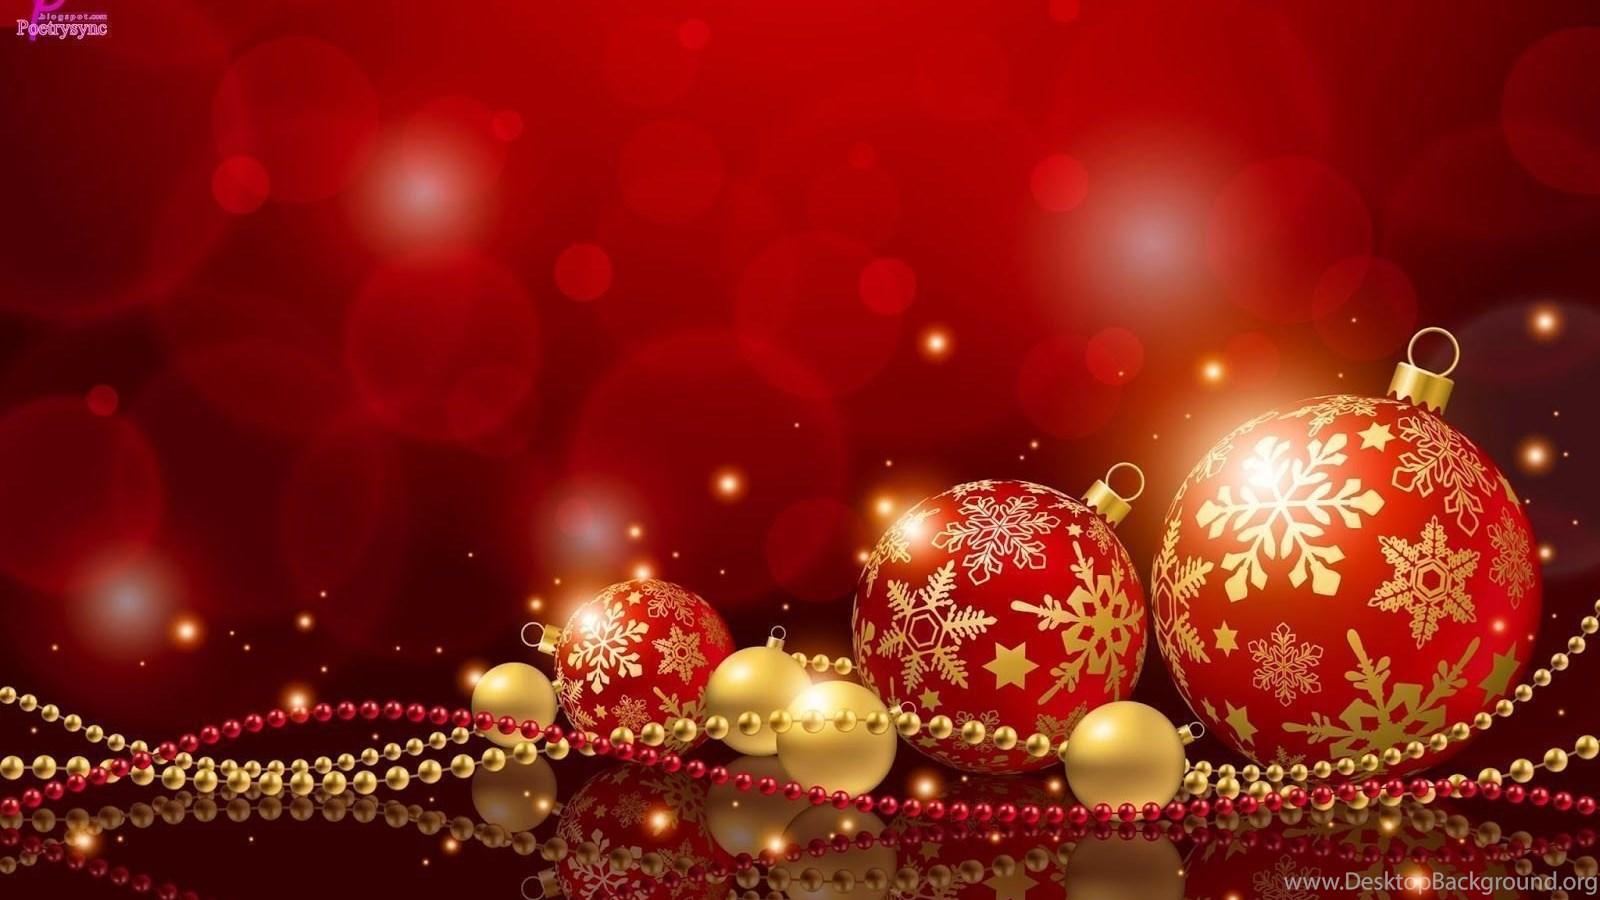 merry christmas hd wallpapers for desktop best hd desktop